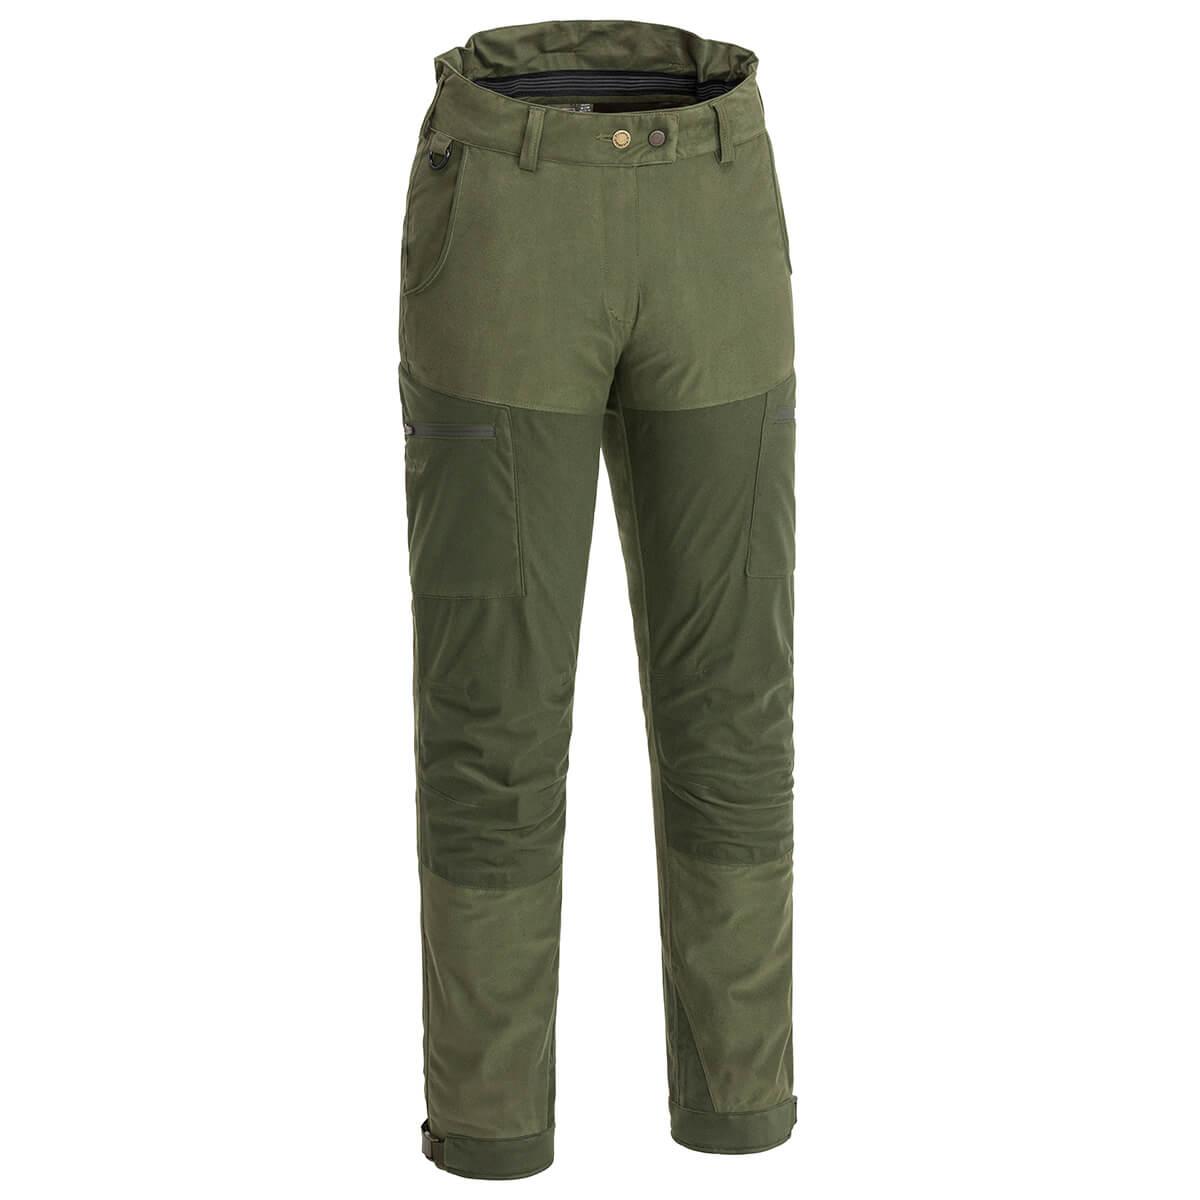 Pinewood Damenhose Retrieve Active - Jagdbekleidung Damen